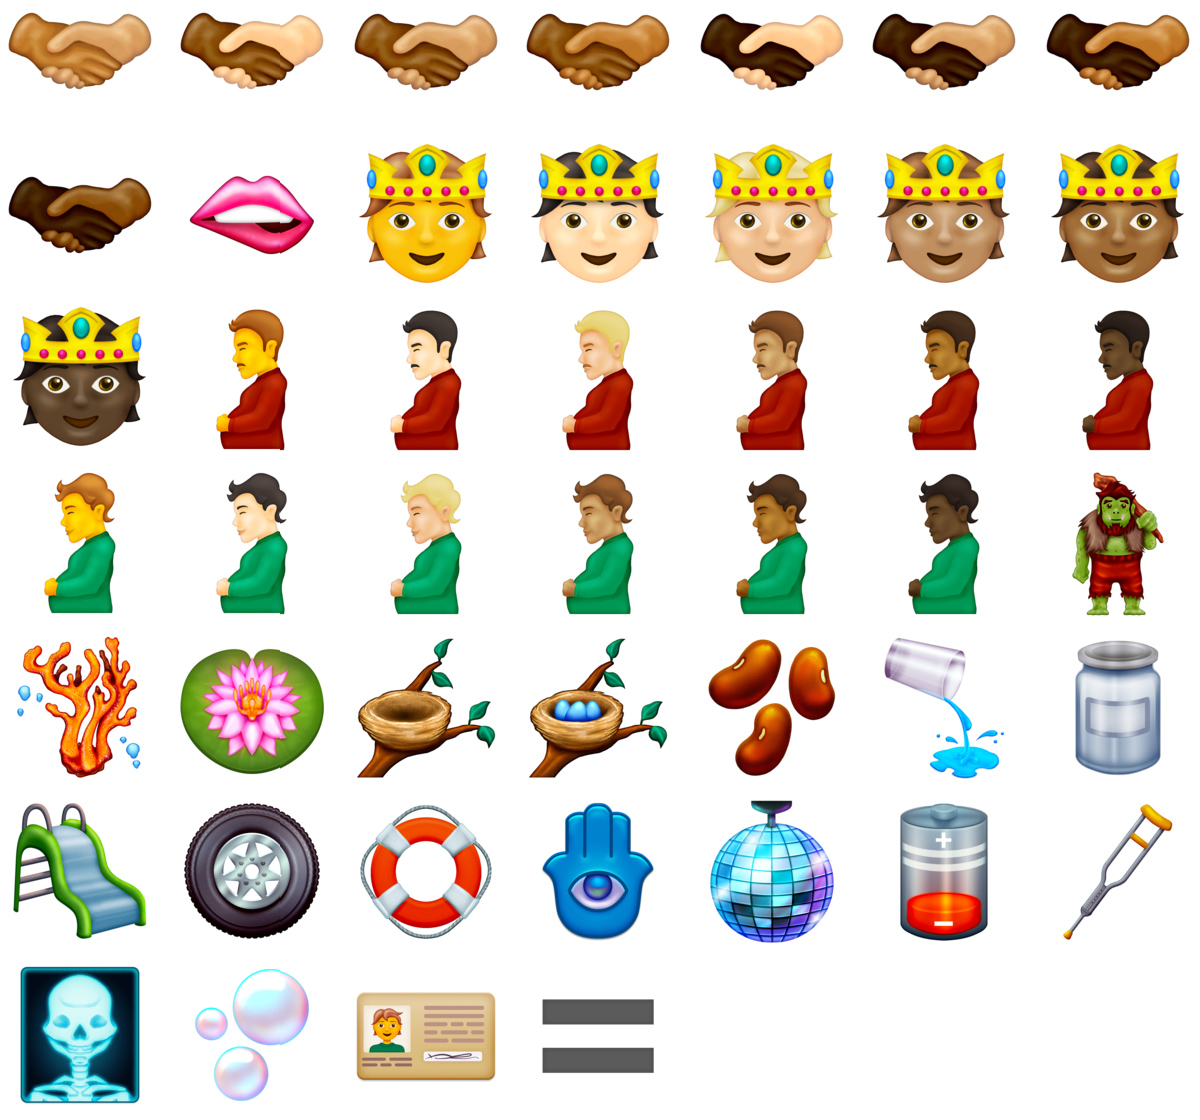 Nye emoji-forslag (Emojipedia)